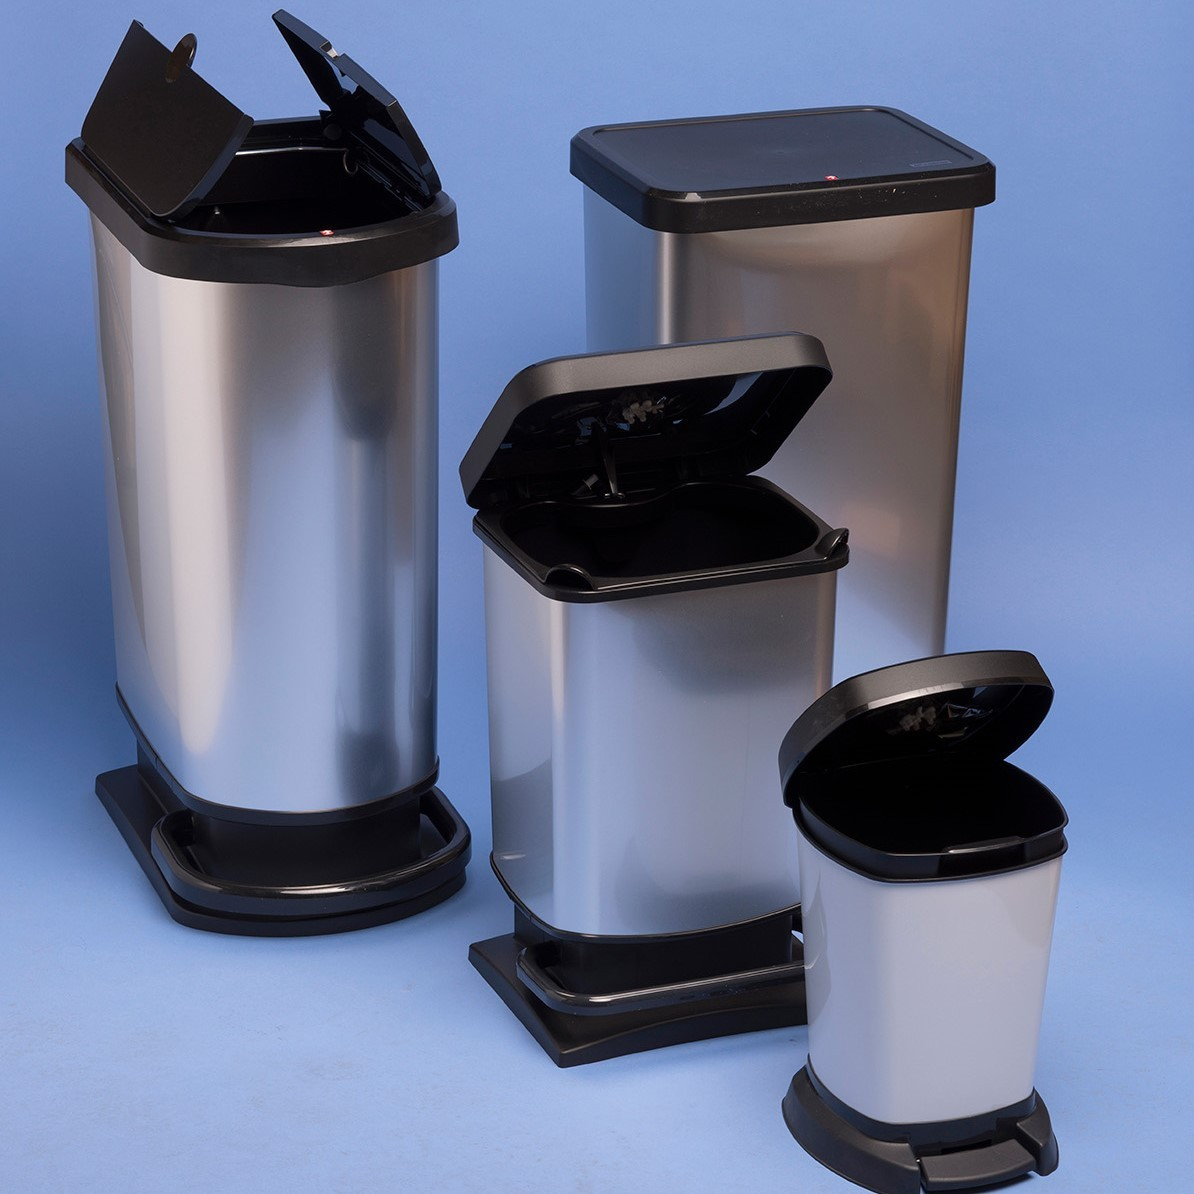 Treteimer PASO |6 - 50 Liter